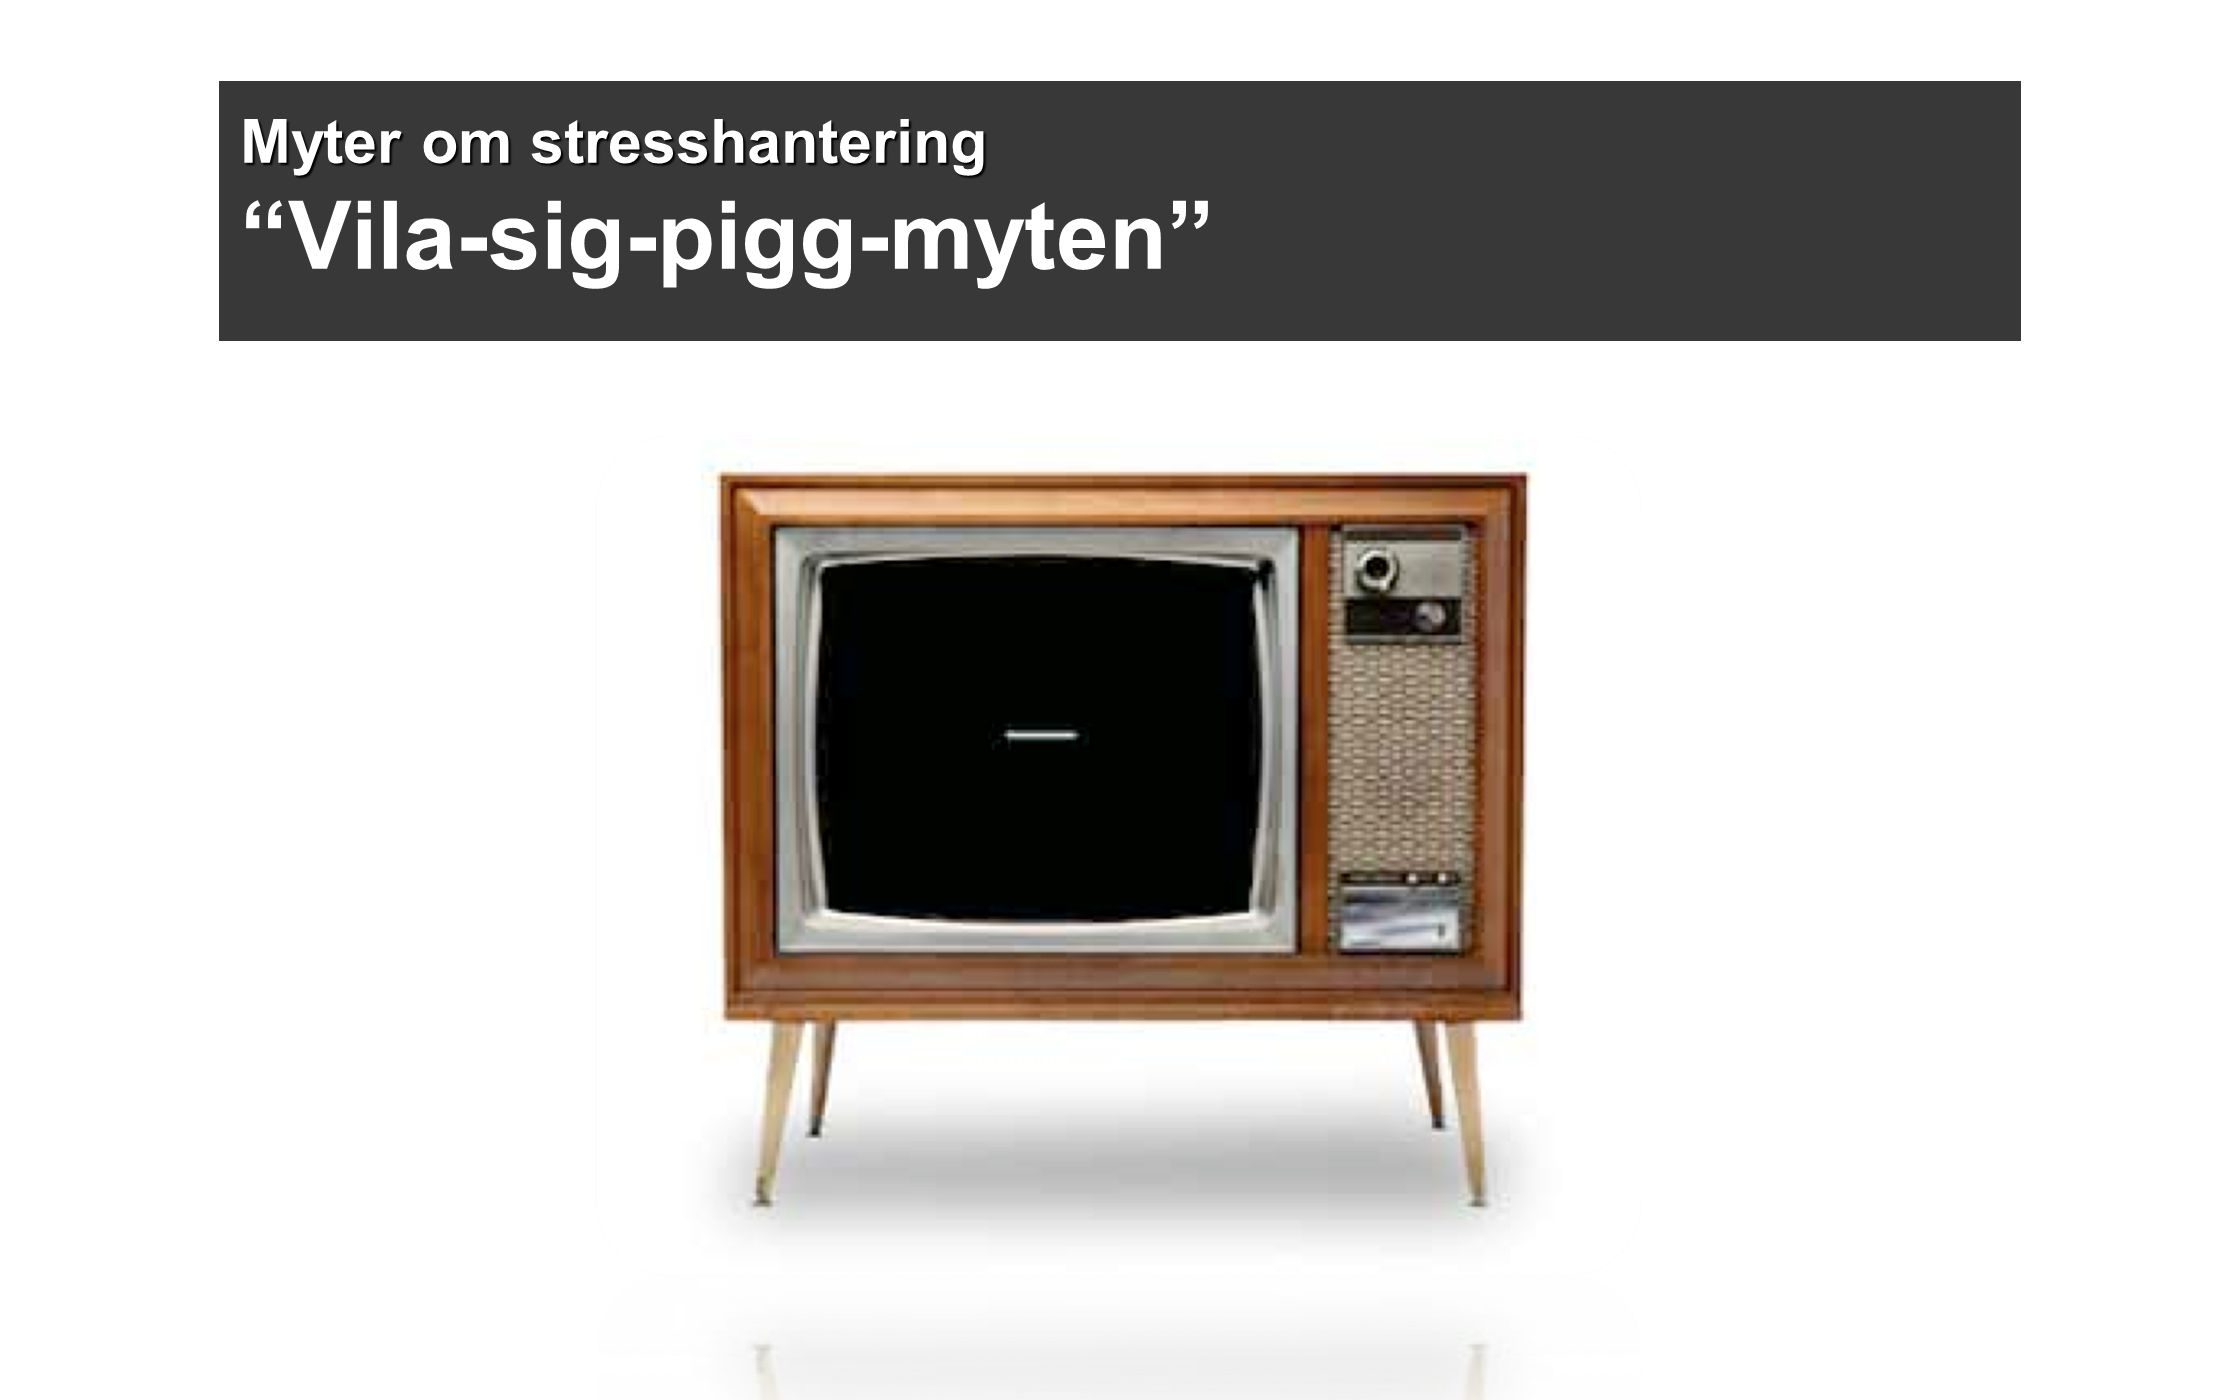 Myter om stresshantering Myter om stresshantering Vila-sig-pigg-myten